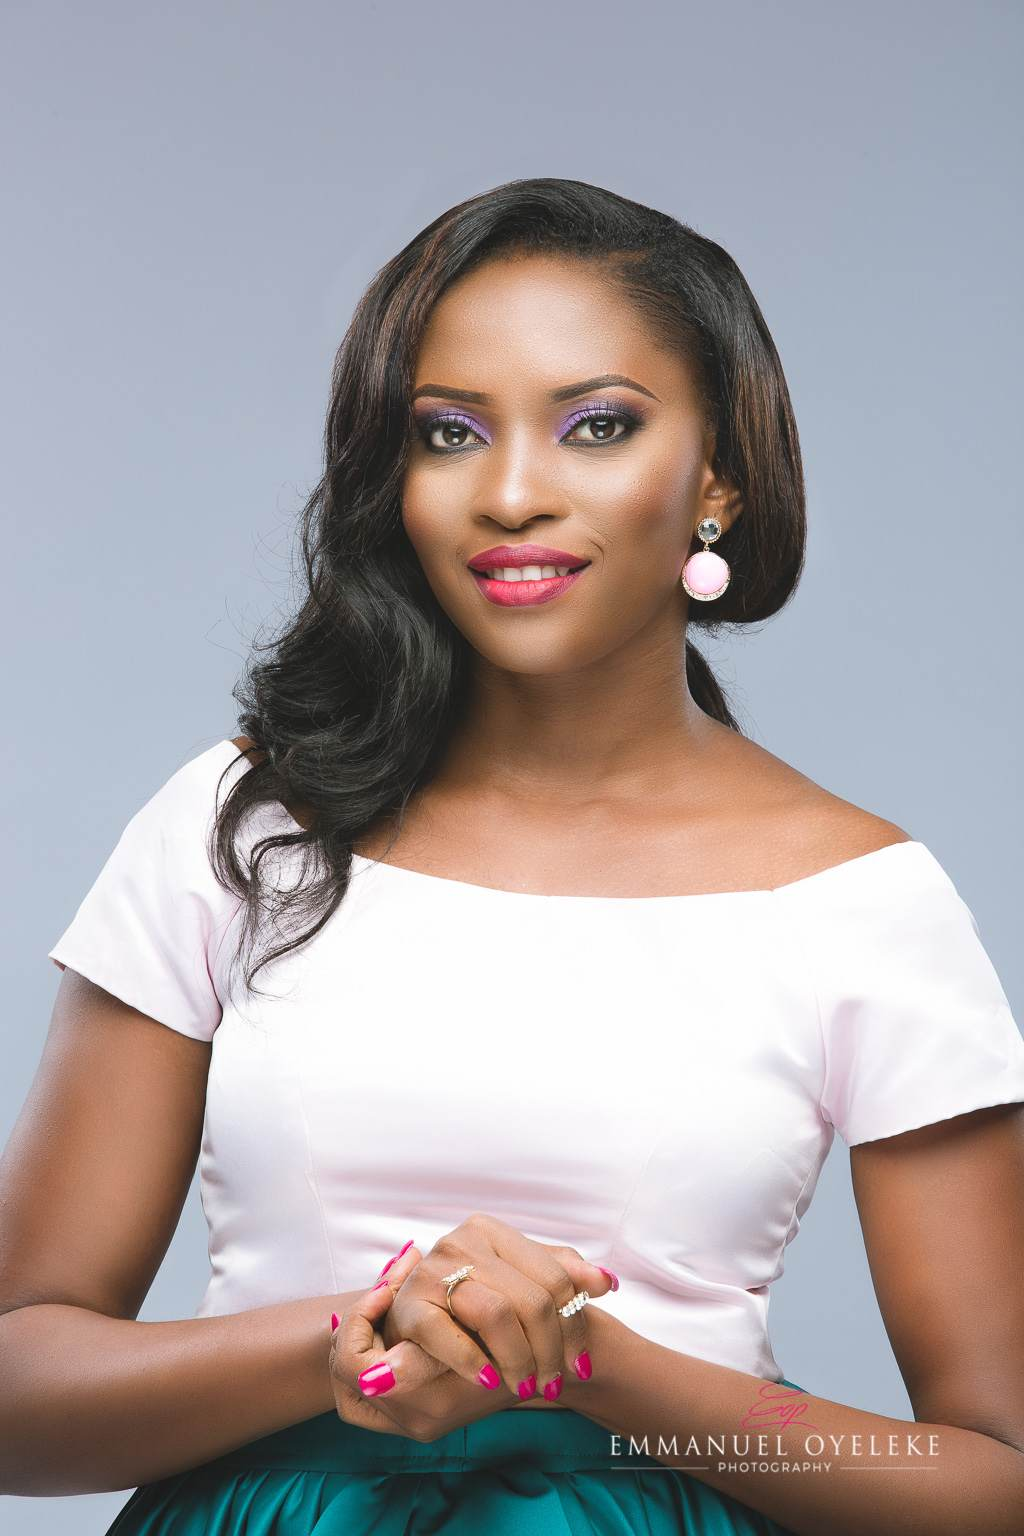 Nigerian Blogger Helen Ozor Releases New Photos To Mark